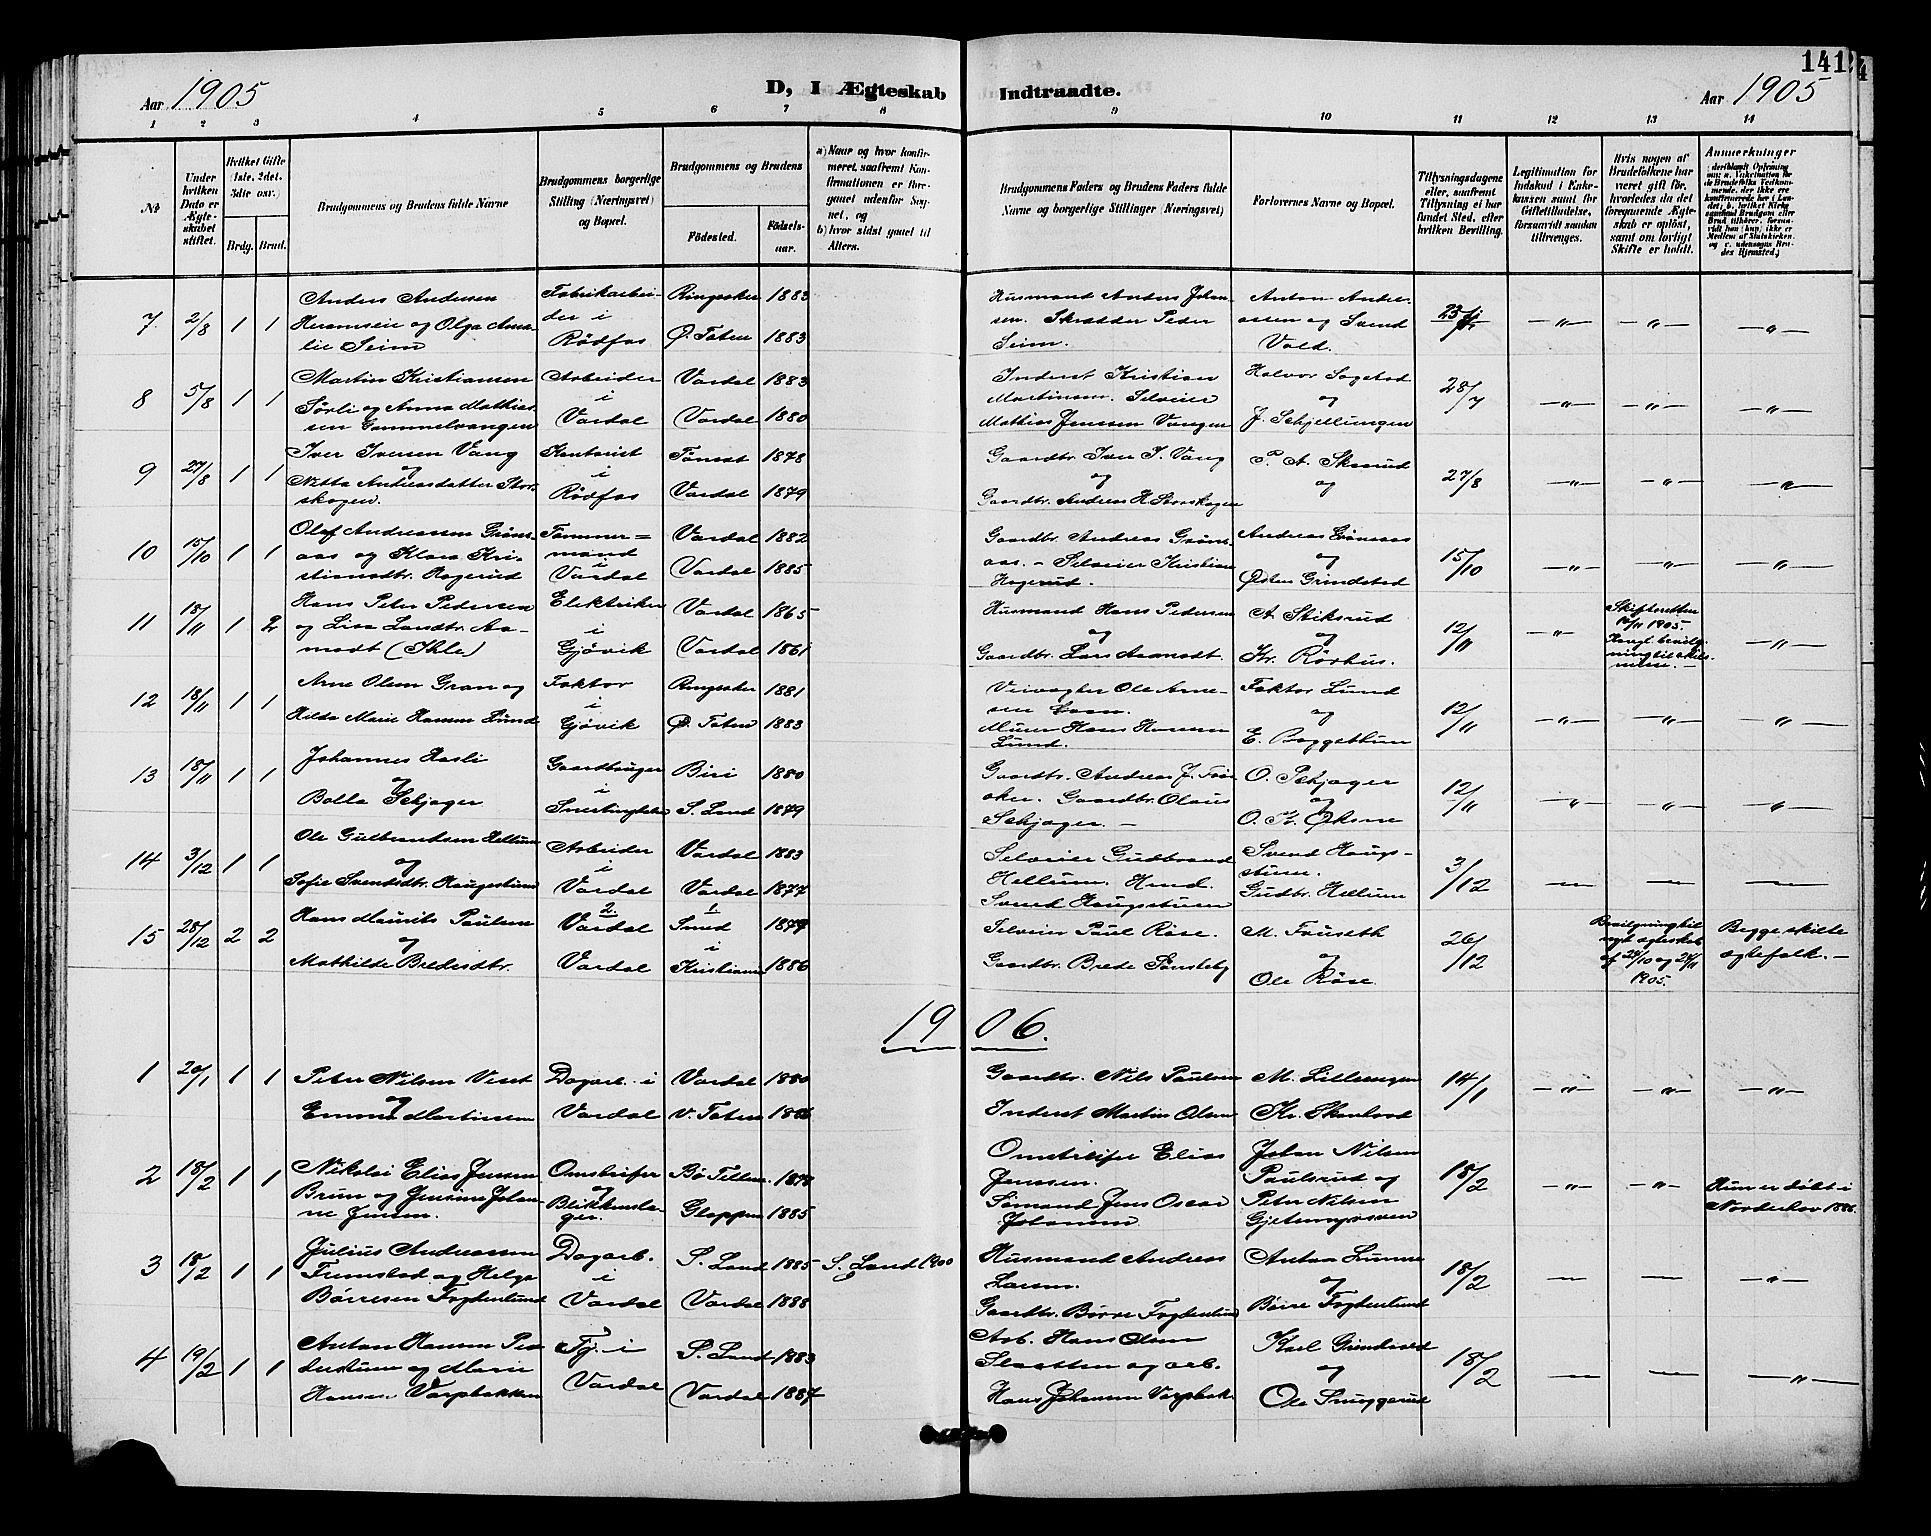 SAH, Vardal prestekontor, H/Ha/Hab/L0011: Klokkerbok nr. 11, 1899-1913, s. 141